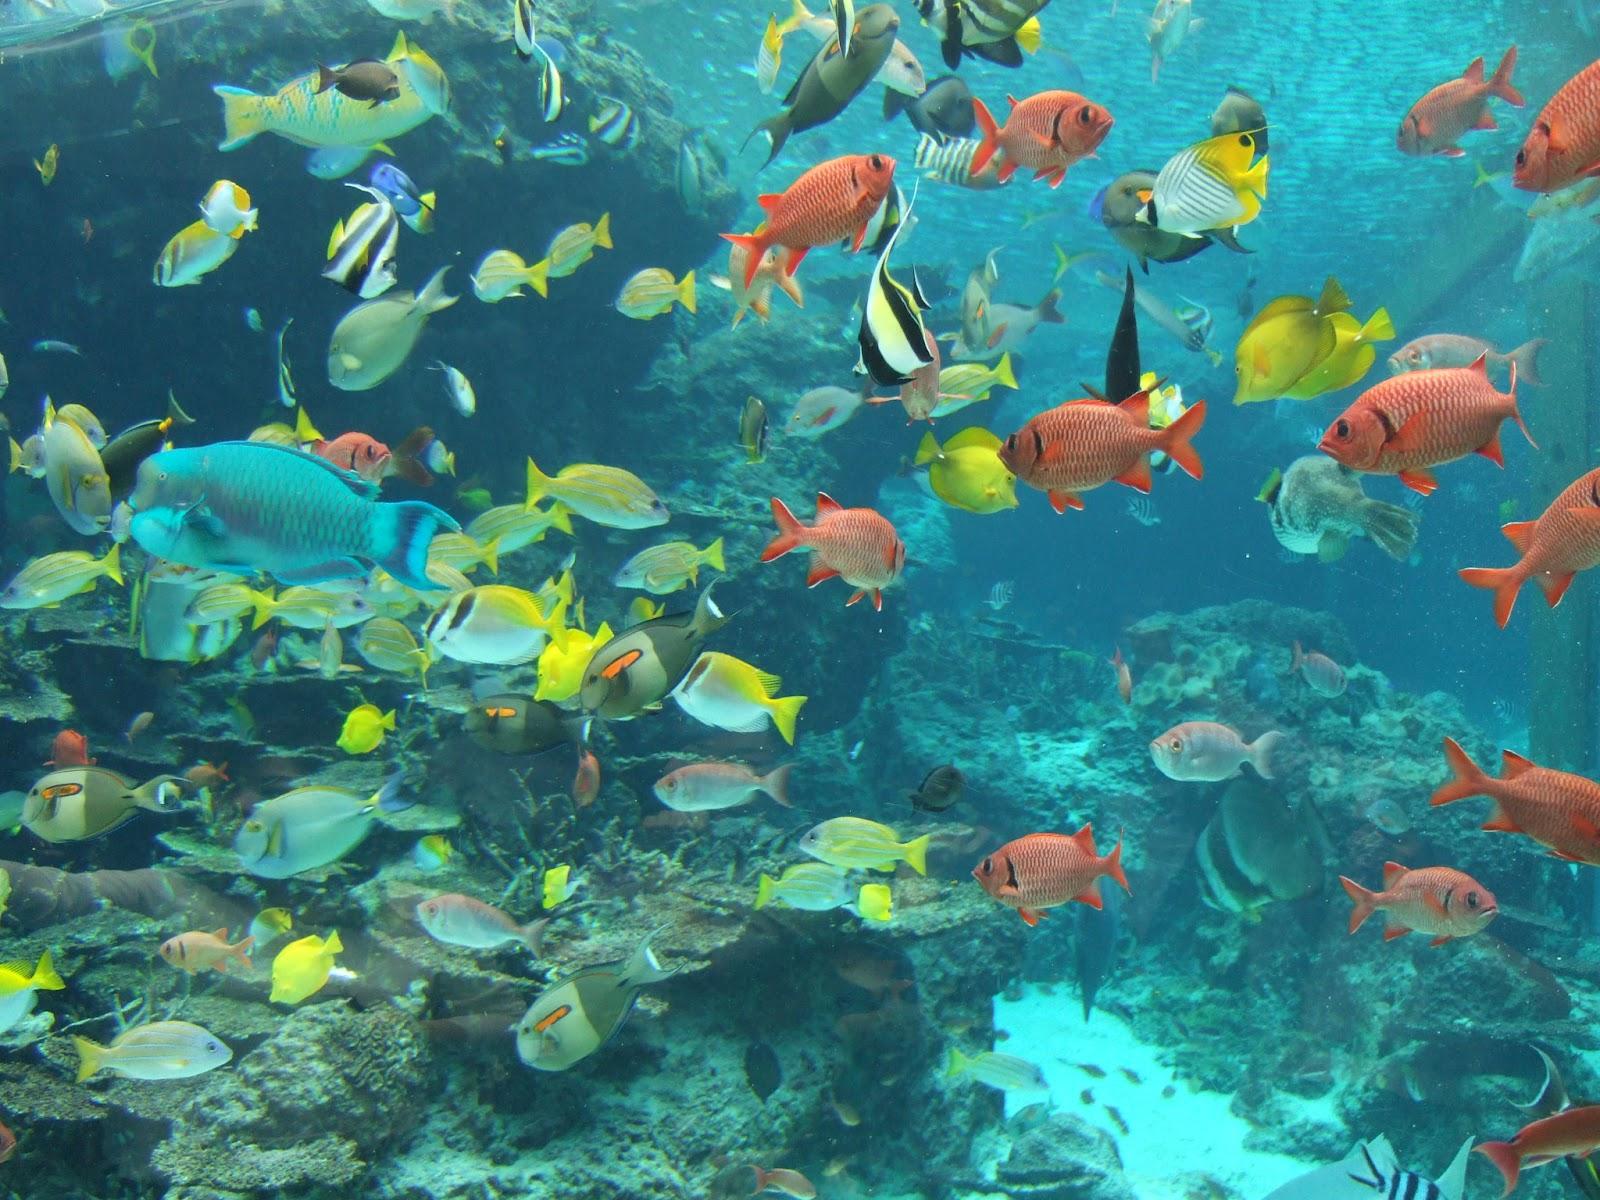 Nature Fish In Okinawa Churaumi Aquarium Okay Wallpaper